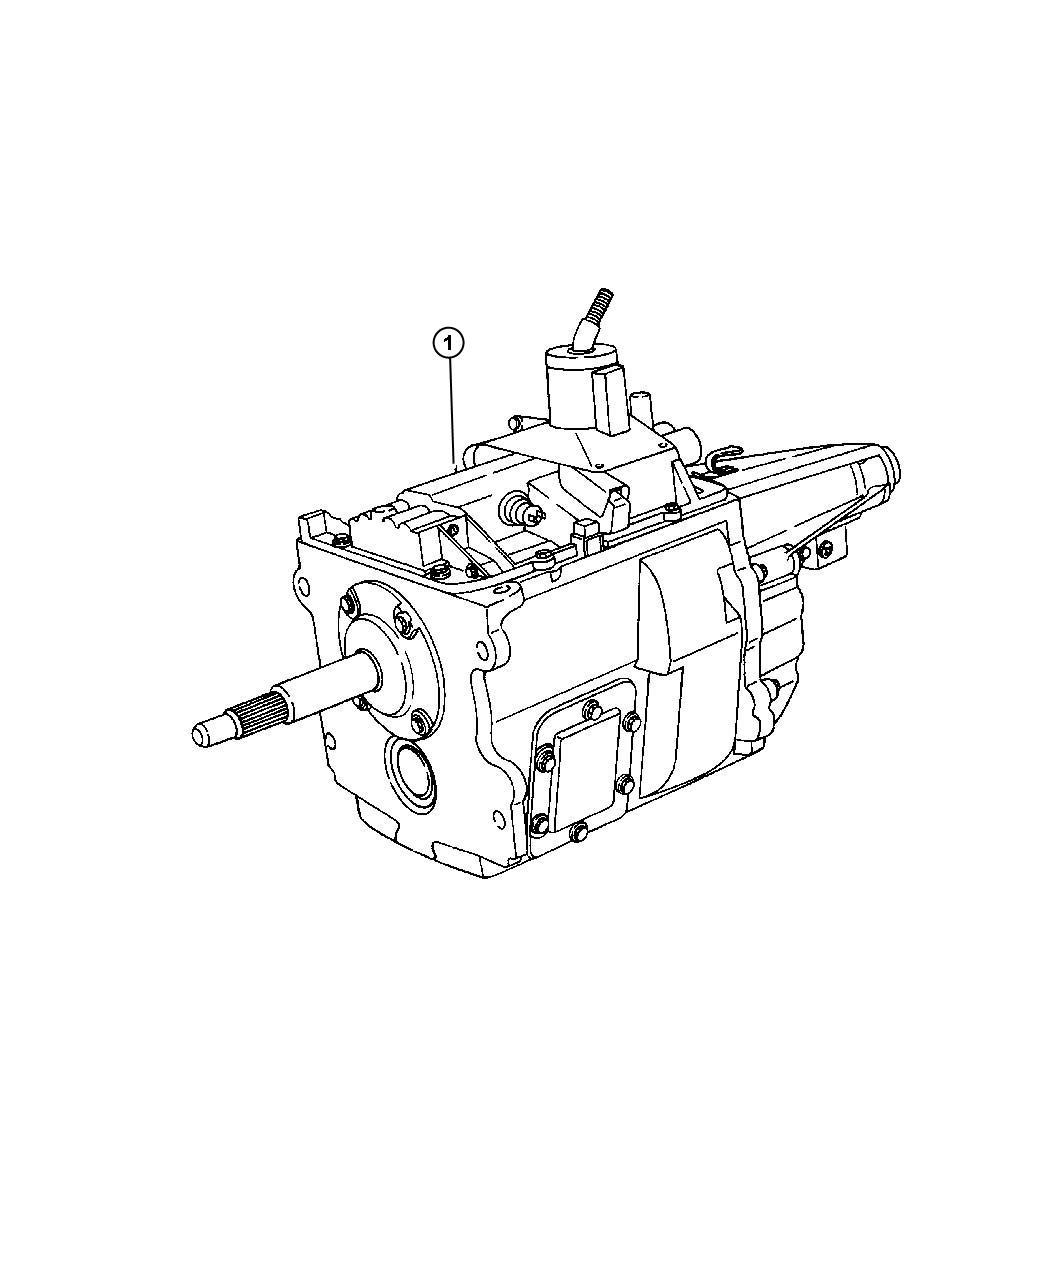 Dodge Grand Caravan Manual Transmission Schematic